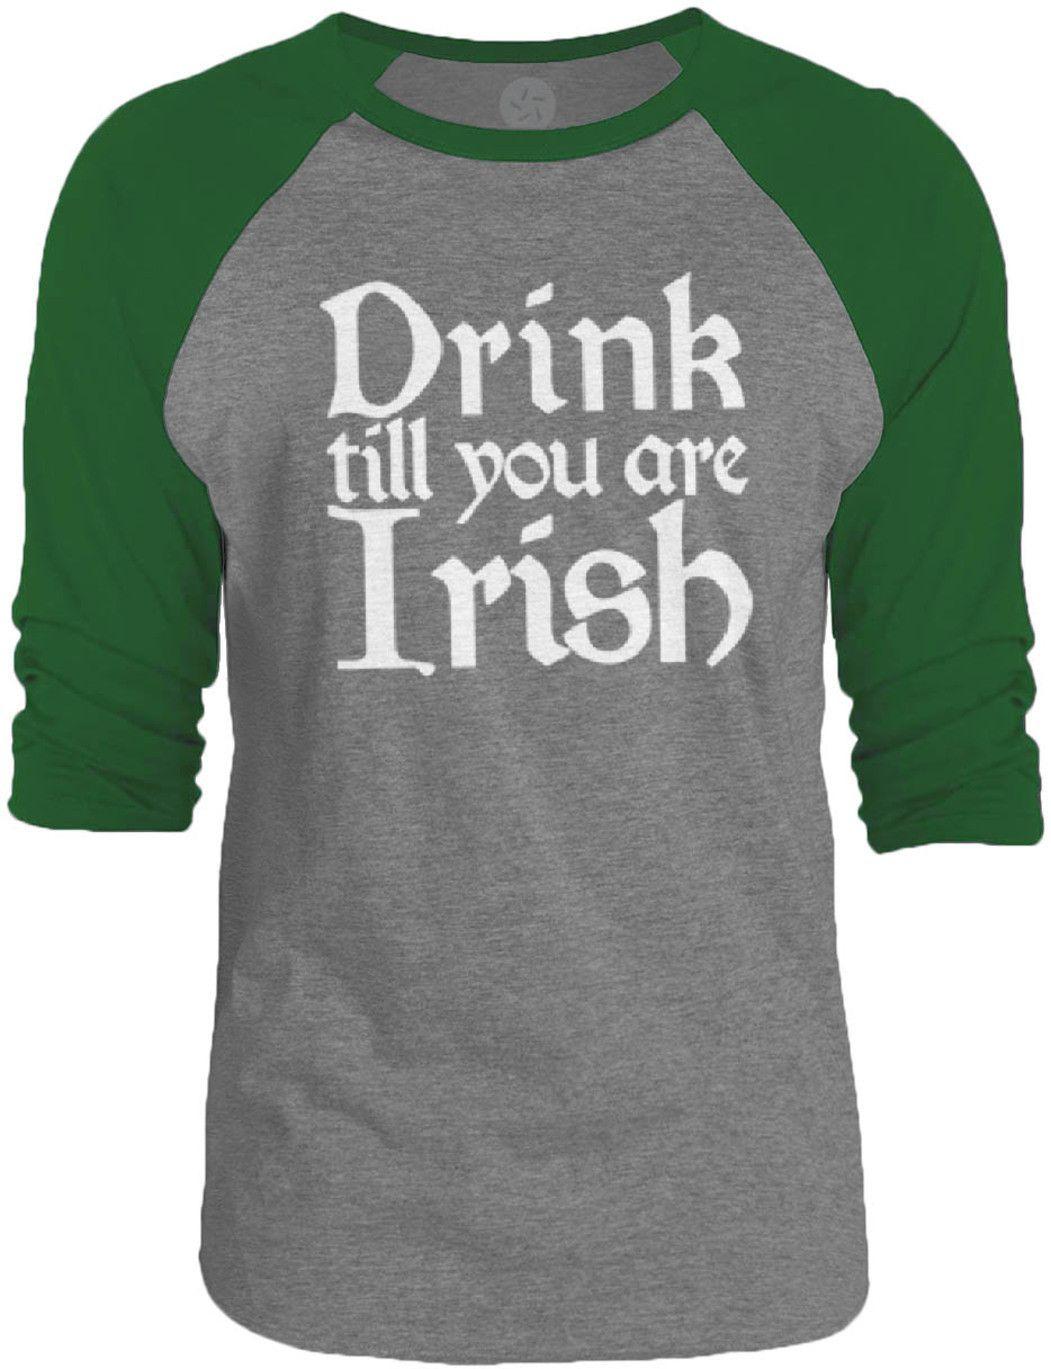 Big Texas Drink till you are Irish (White) 3/4-Sleeve Raglan Baseball T-Shirt